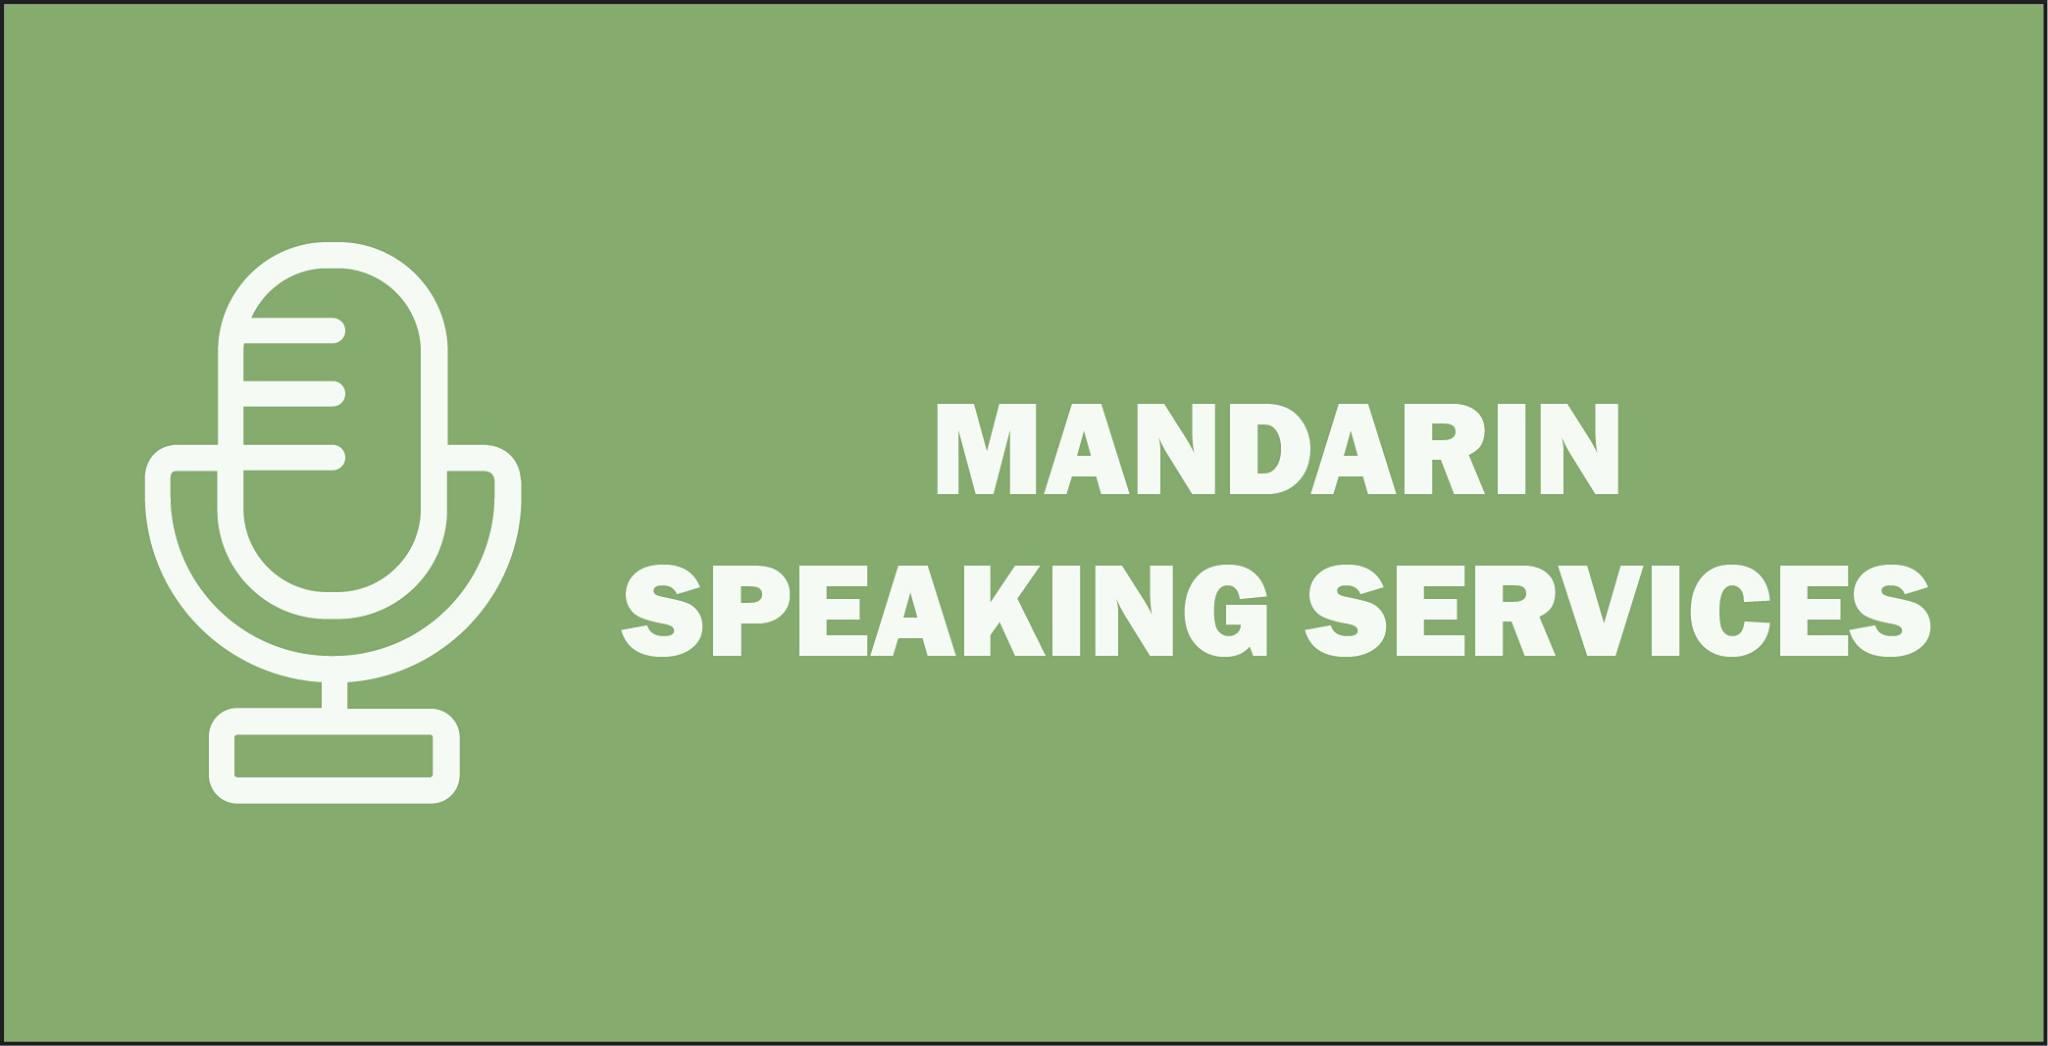 Recent MANDARIN Speaking Services